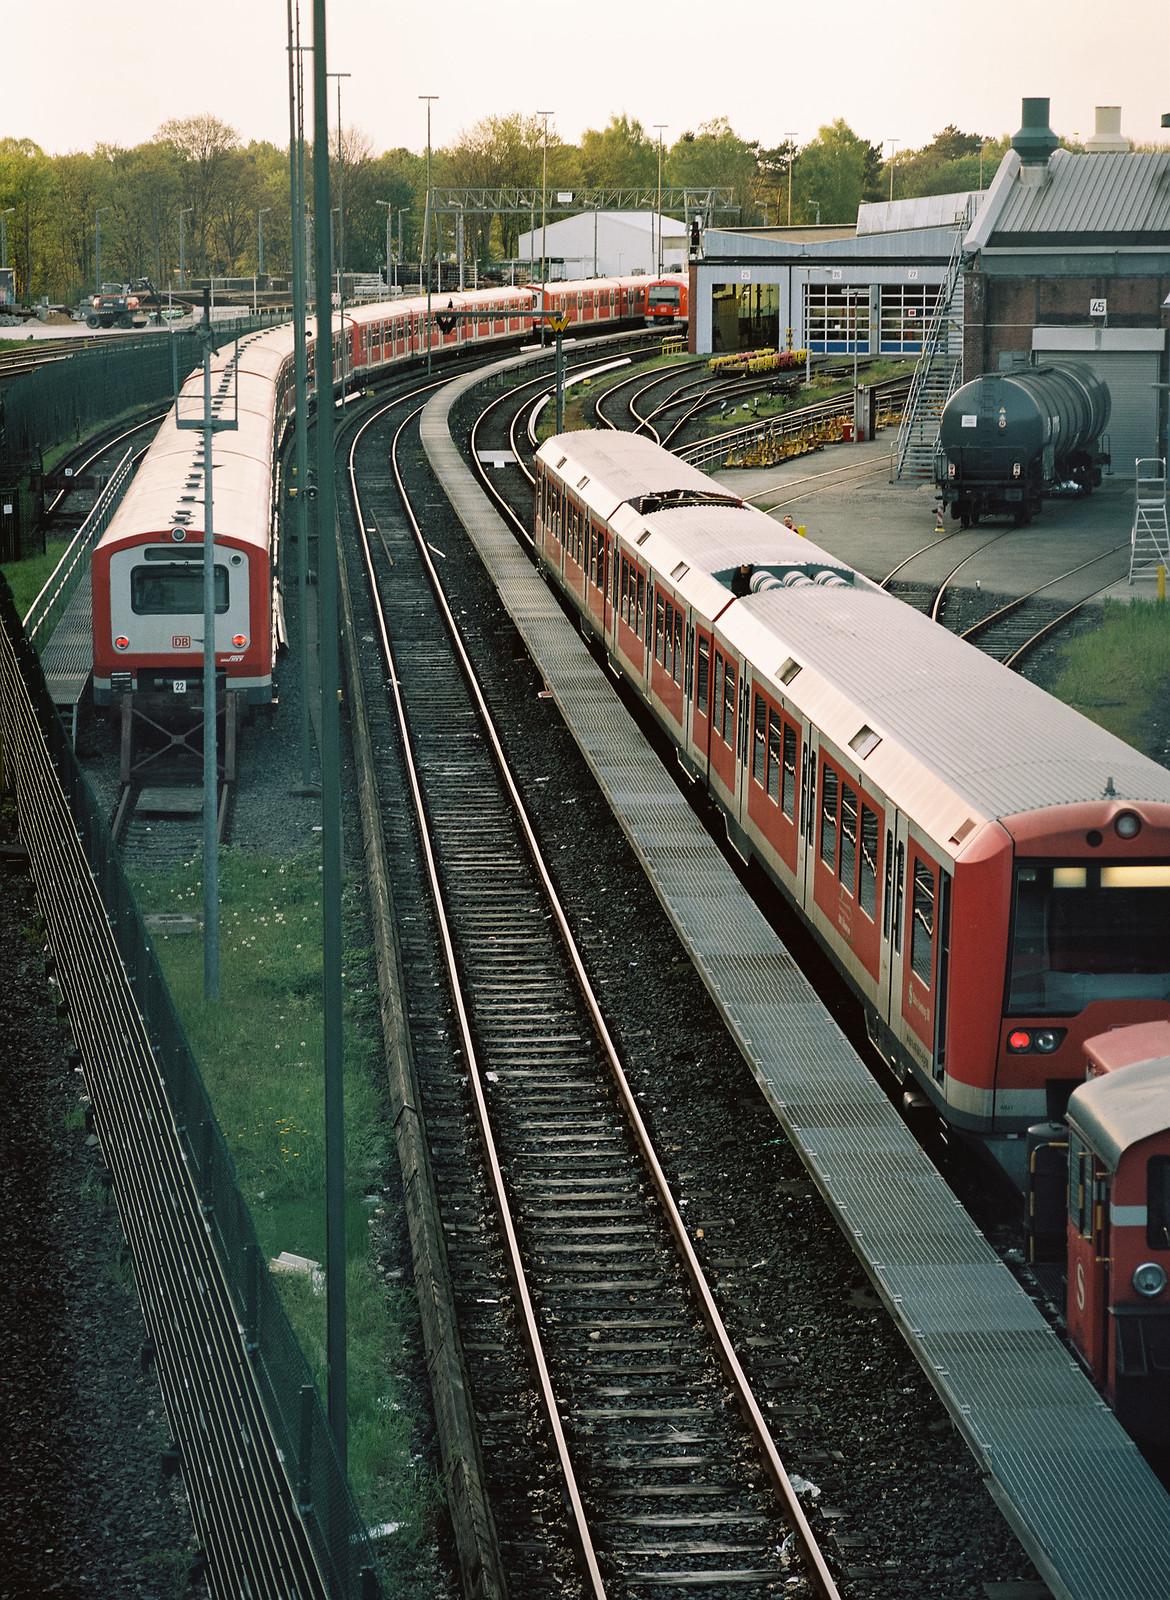 Trainyard Ohlsdorf